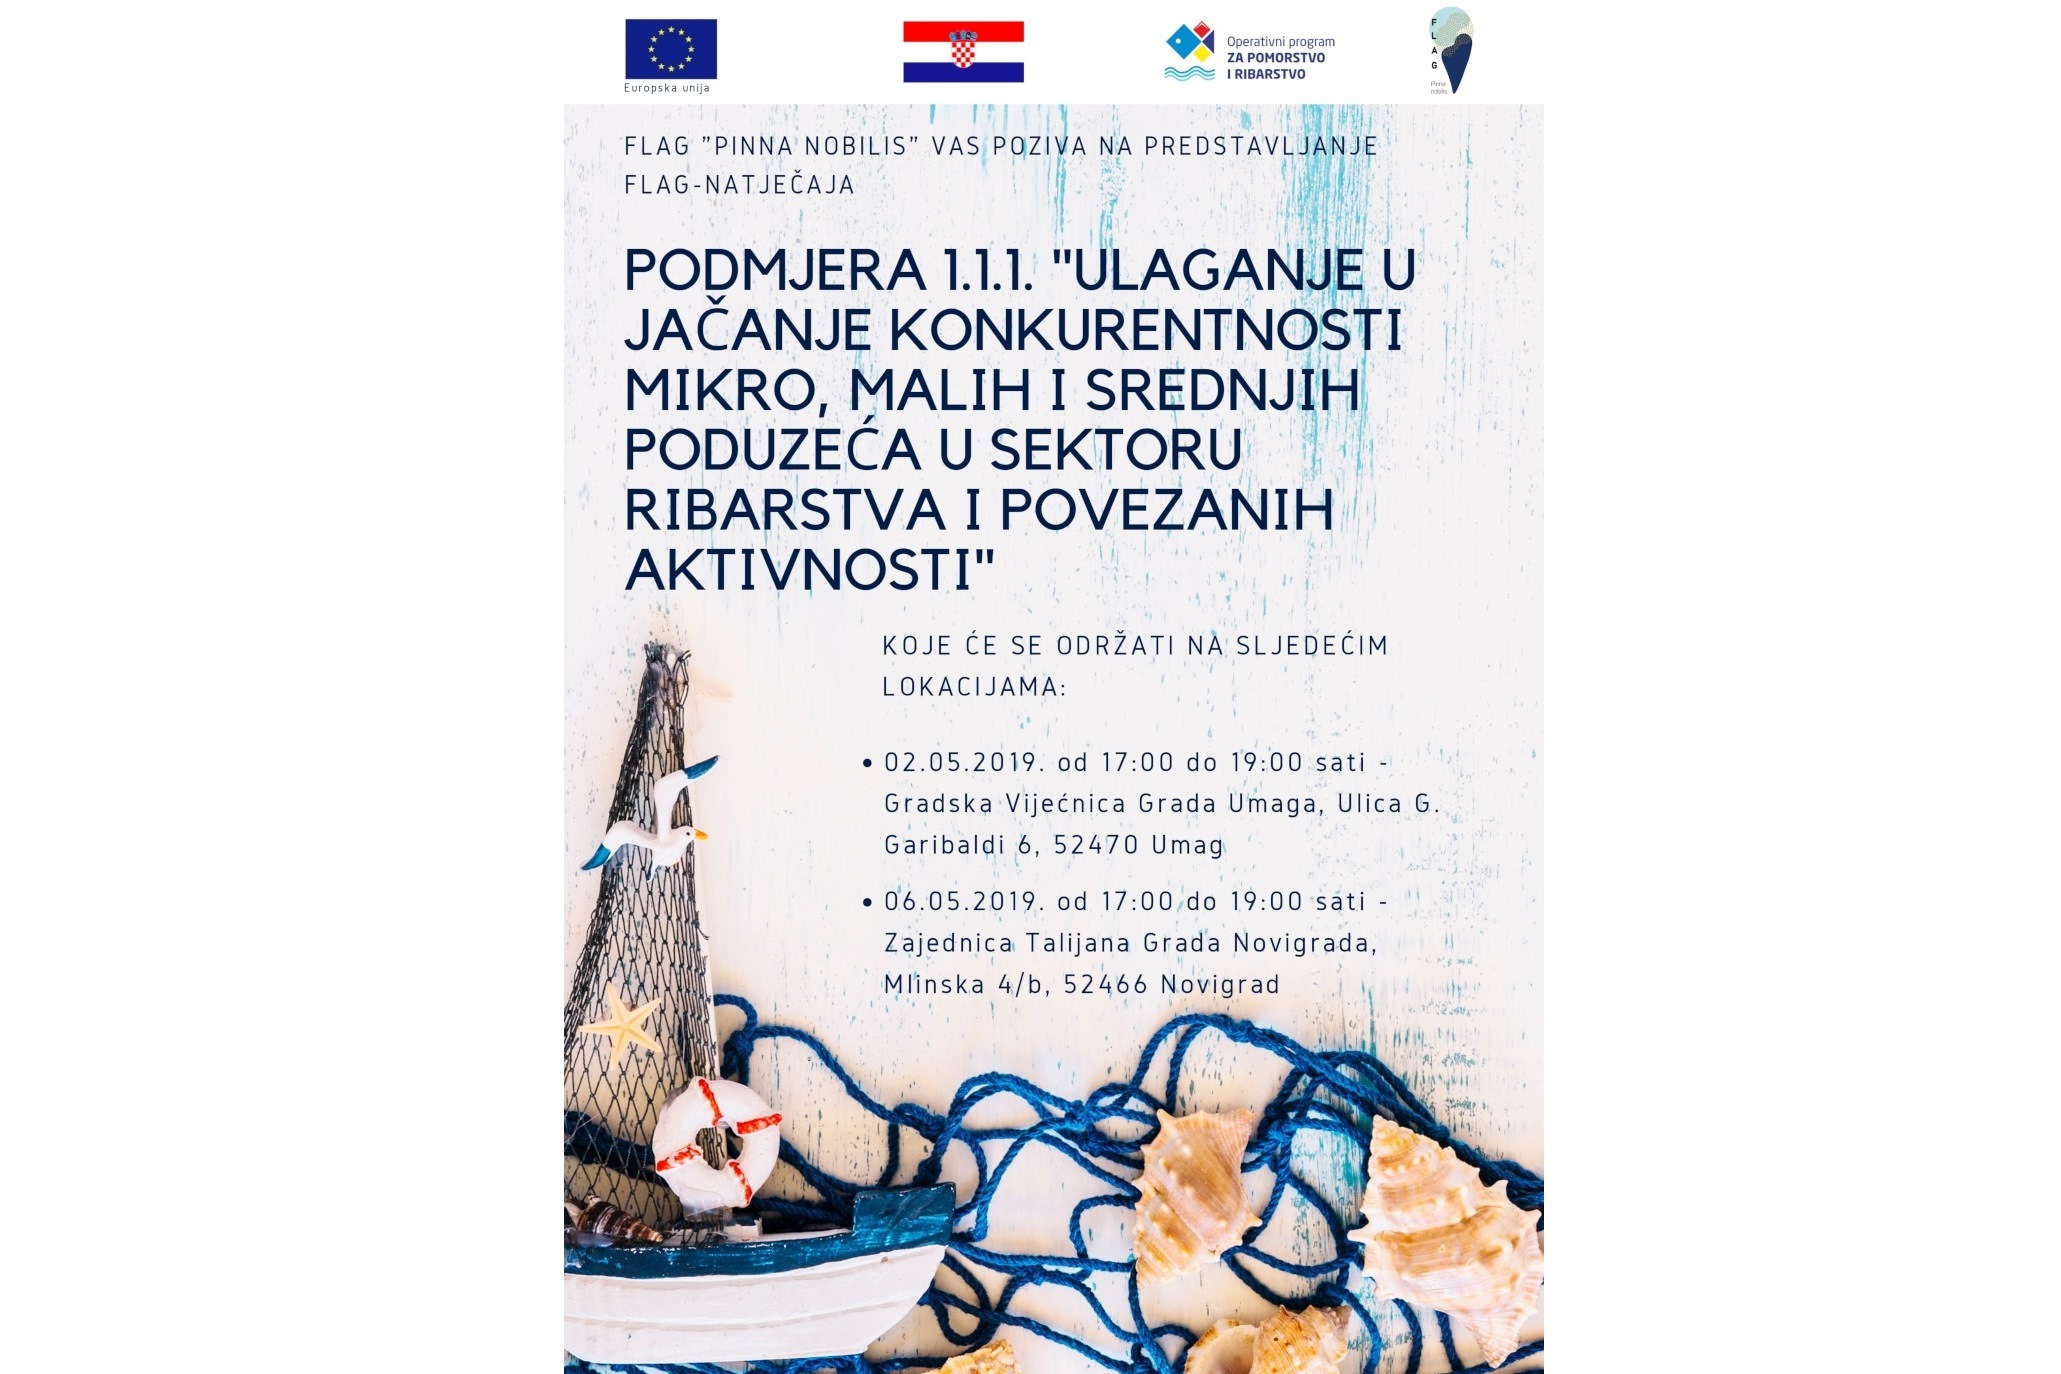 https://novigrad.hr/flag_pinna_nobilis_objavio_1._flag_natjechaj_za_podmjeru_1.1.1._iz_svoje_lo